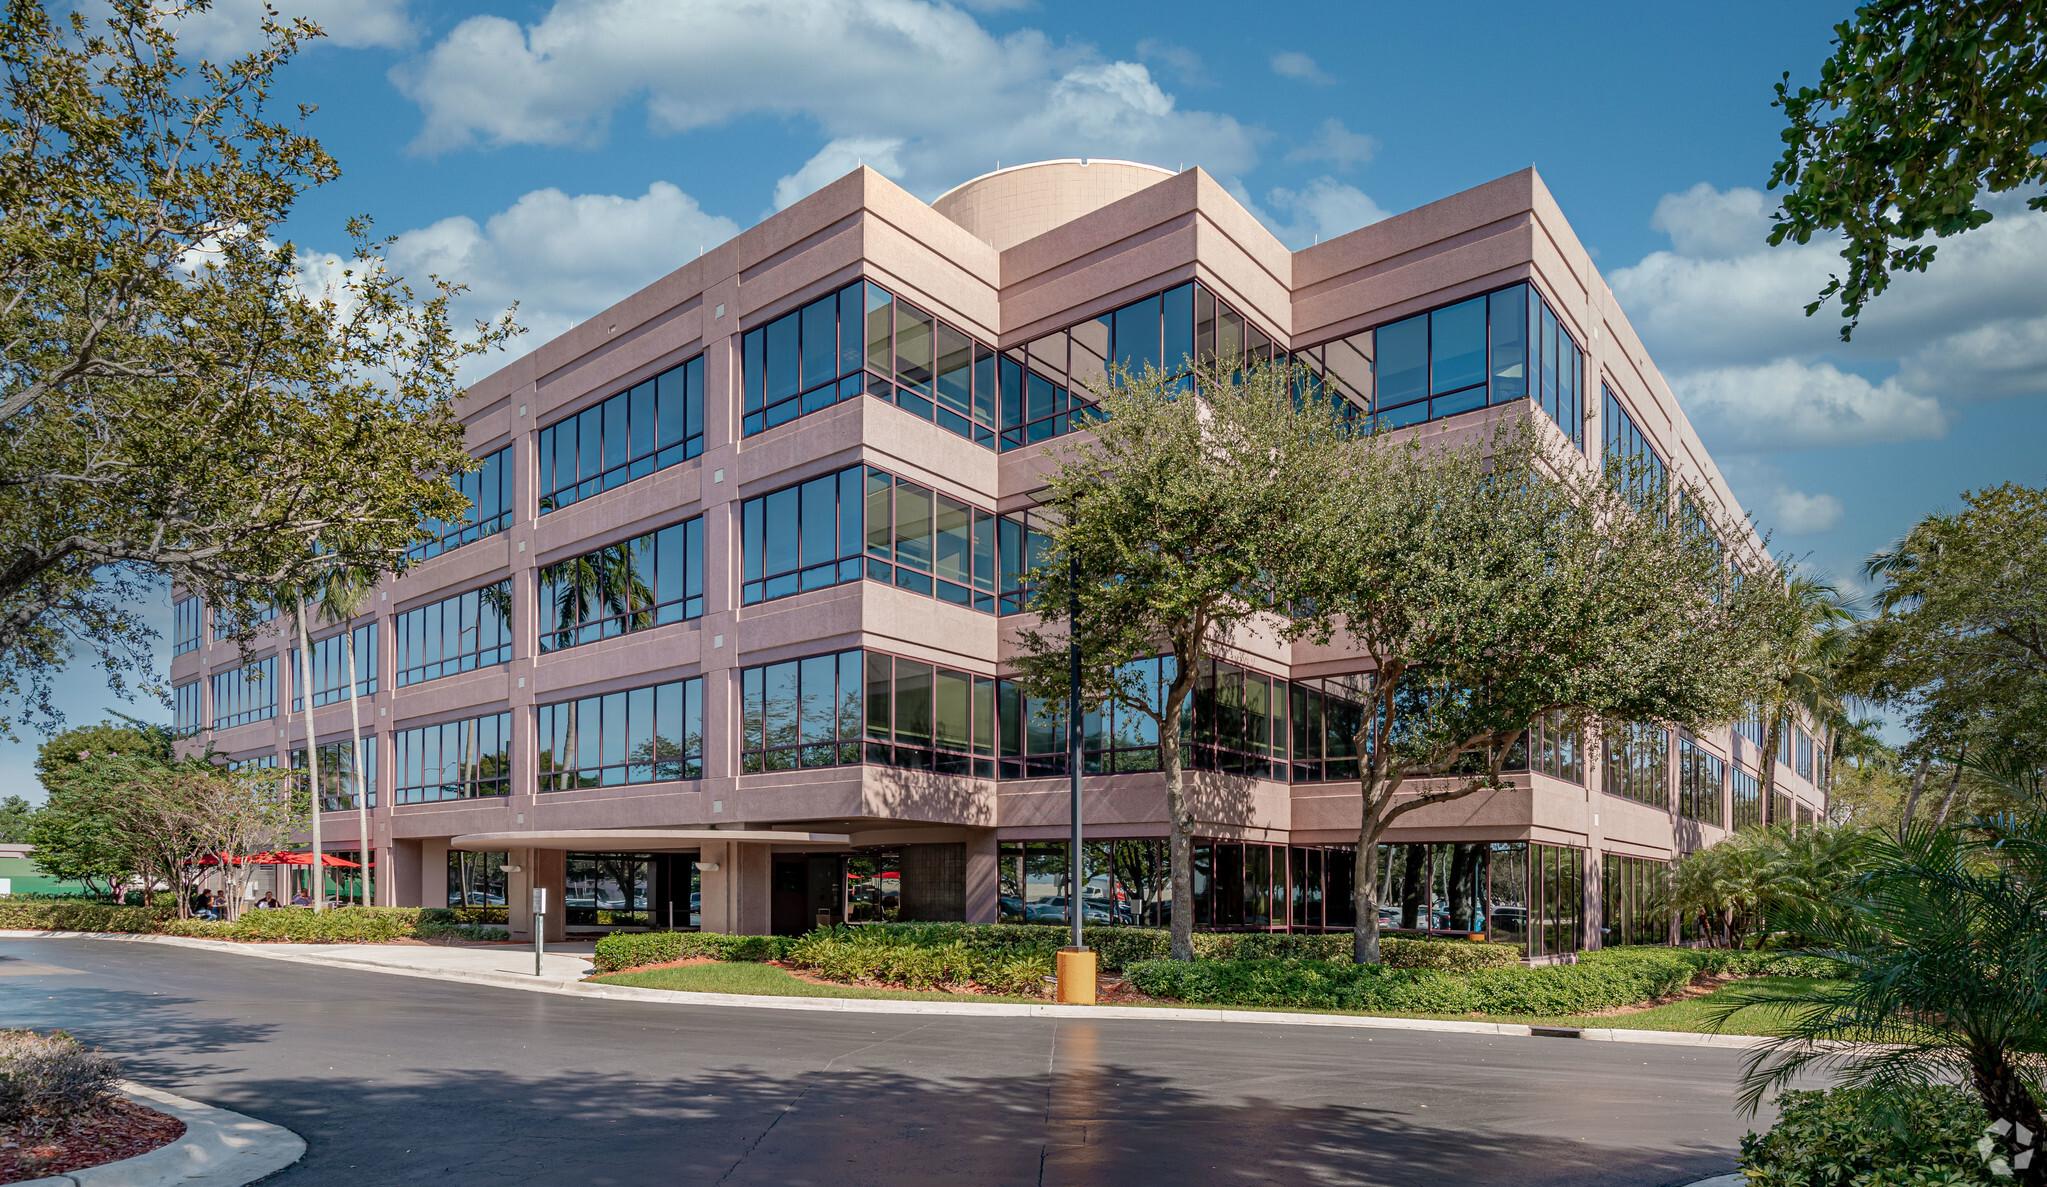 Commercial Property Management